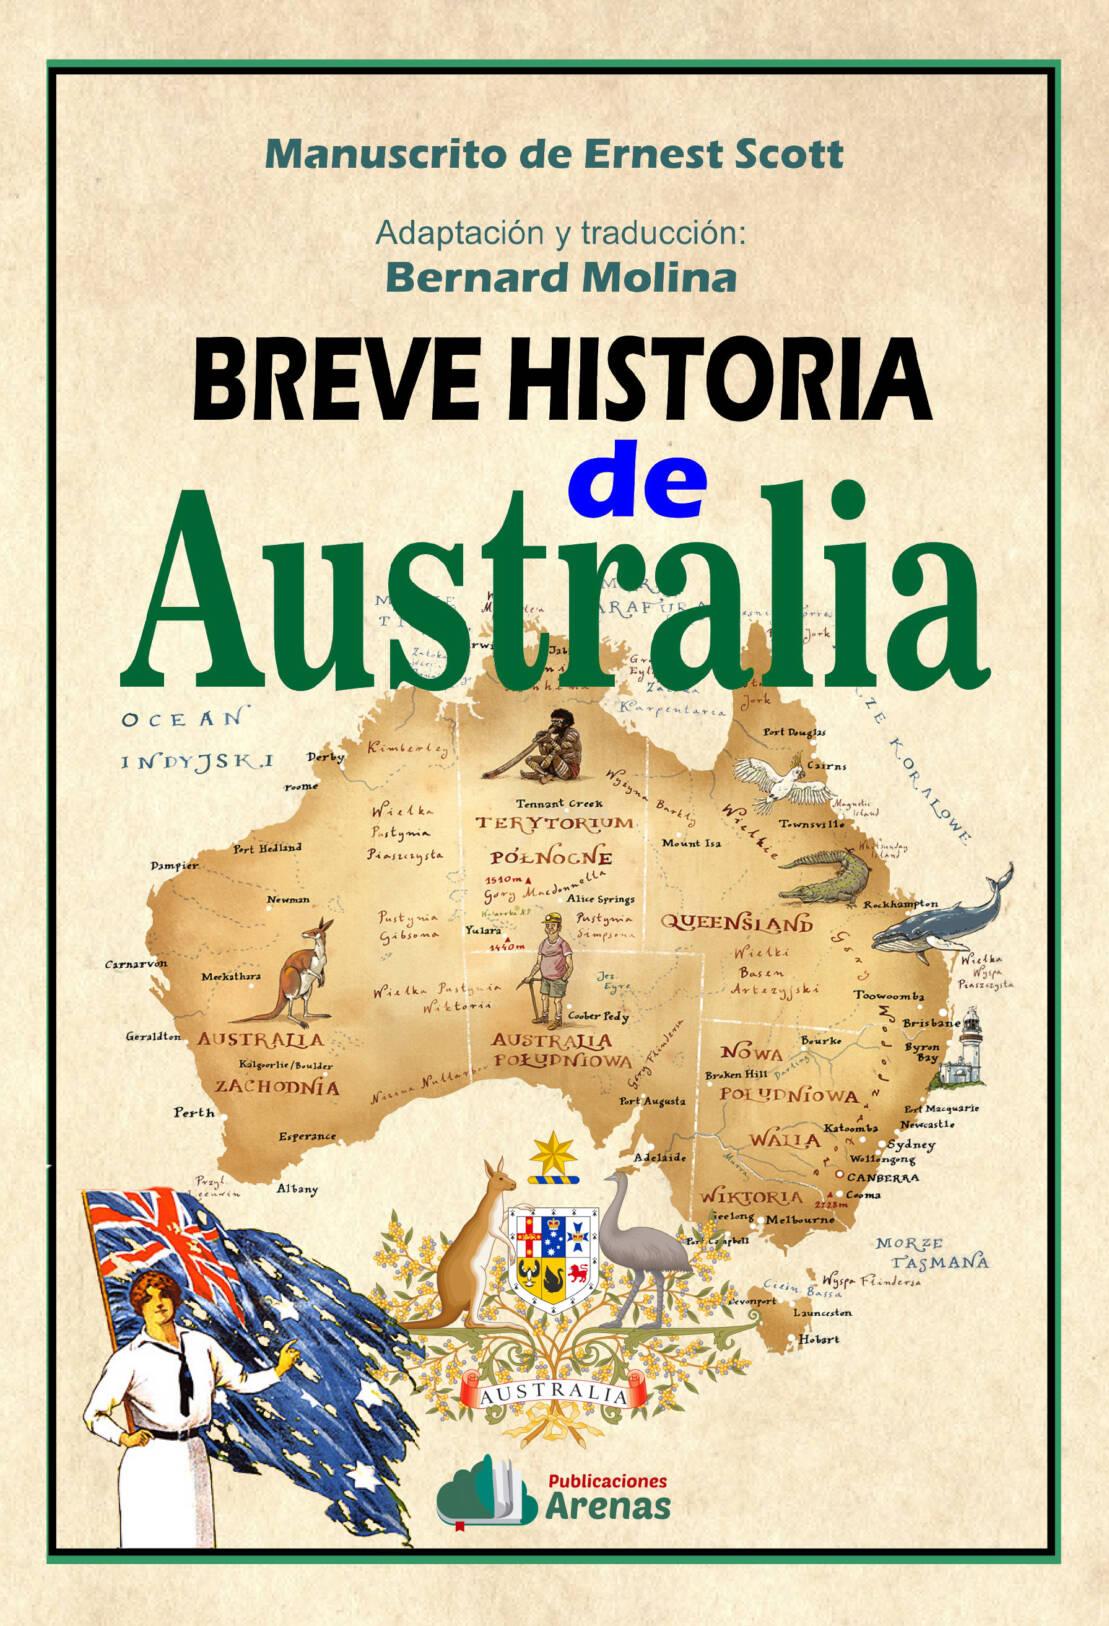 Portada-completa-AUSTRALIA-e1618069494863.jpg